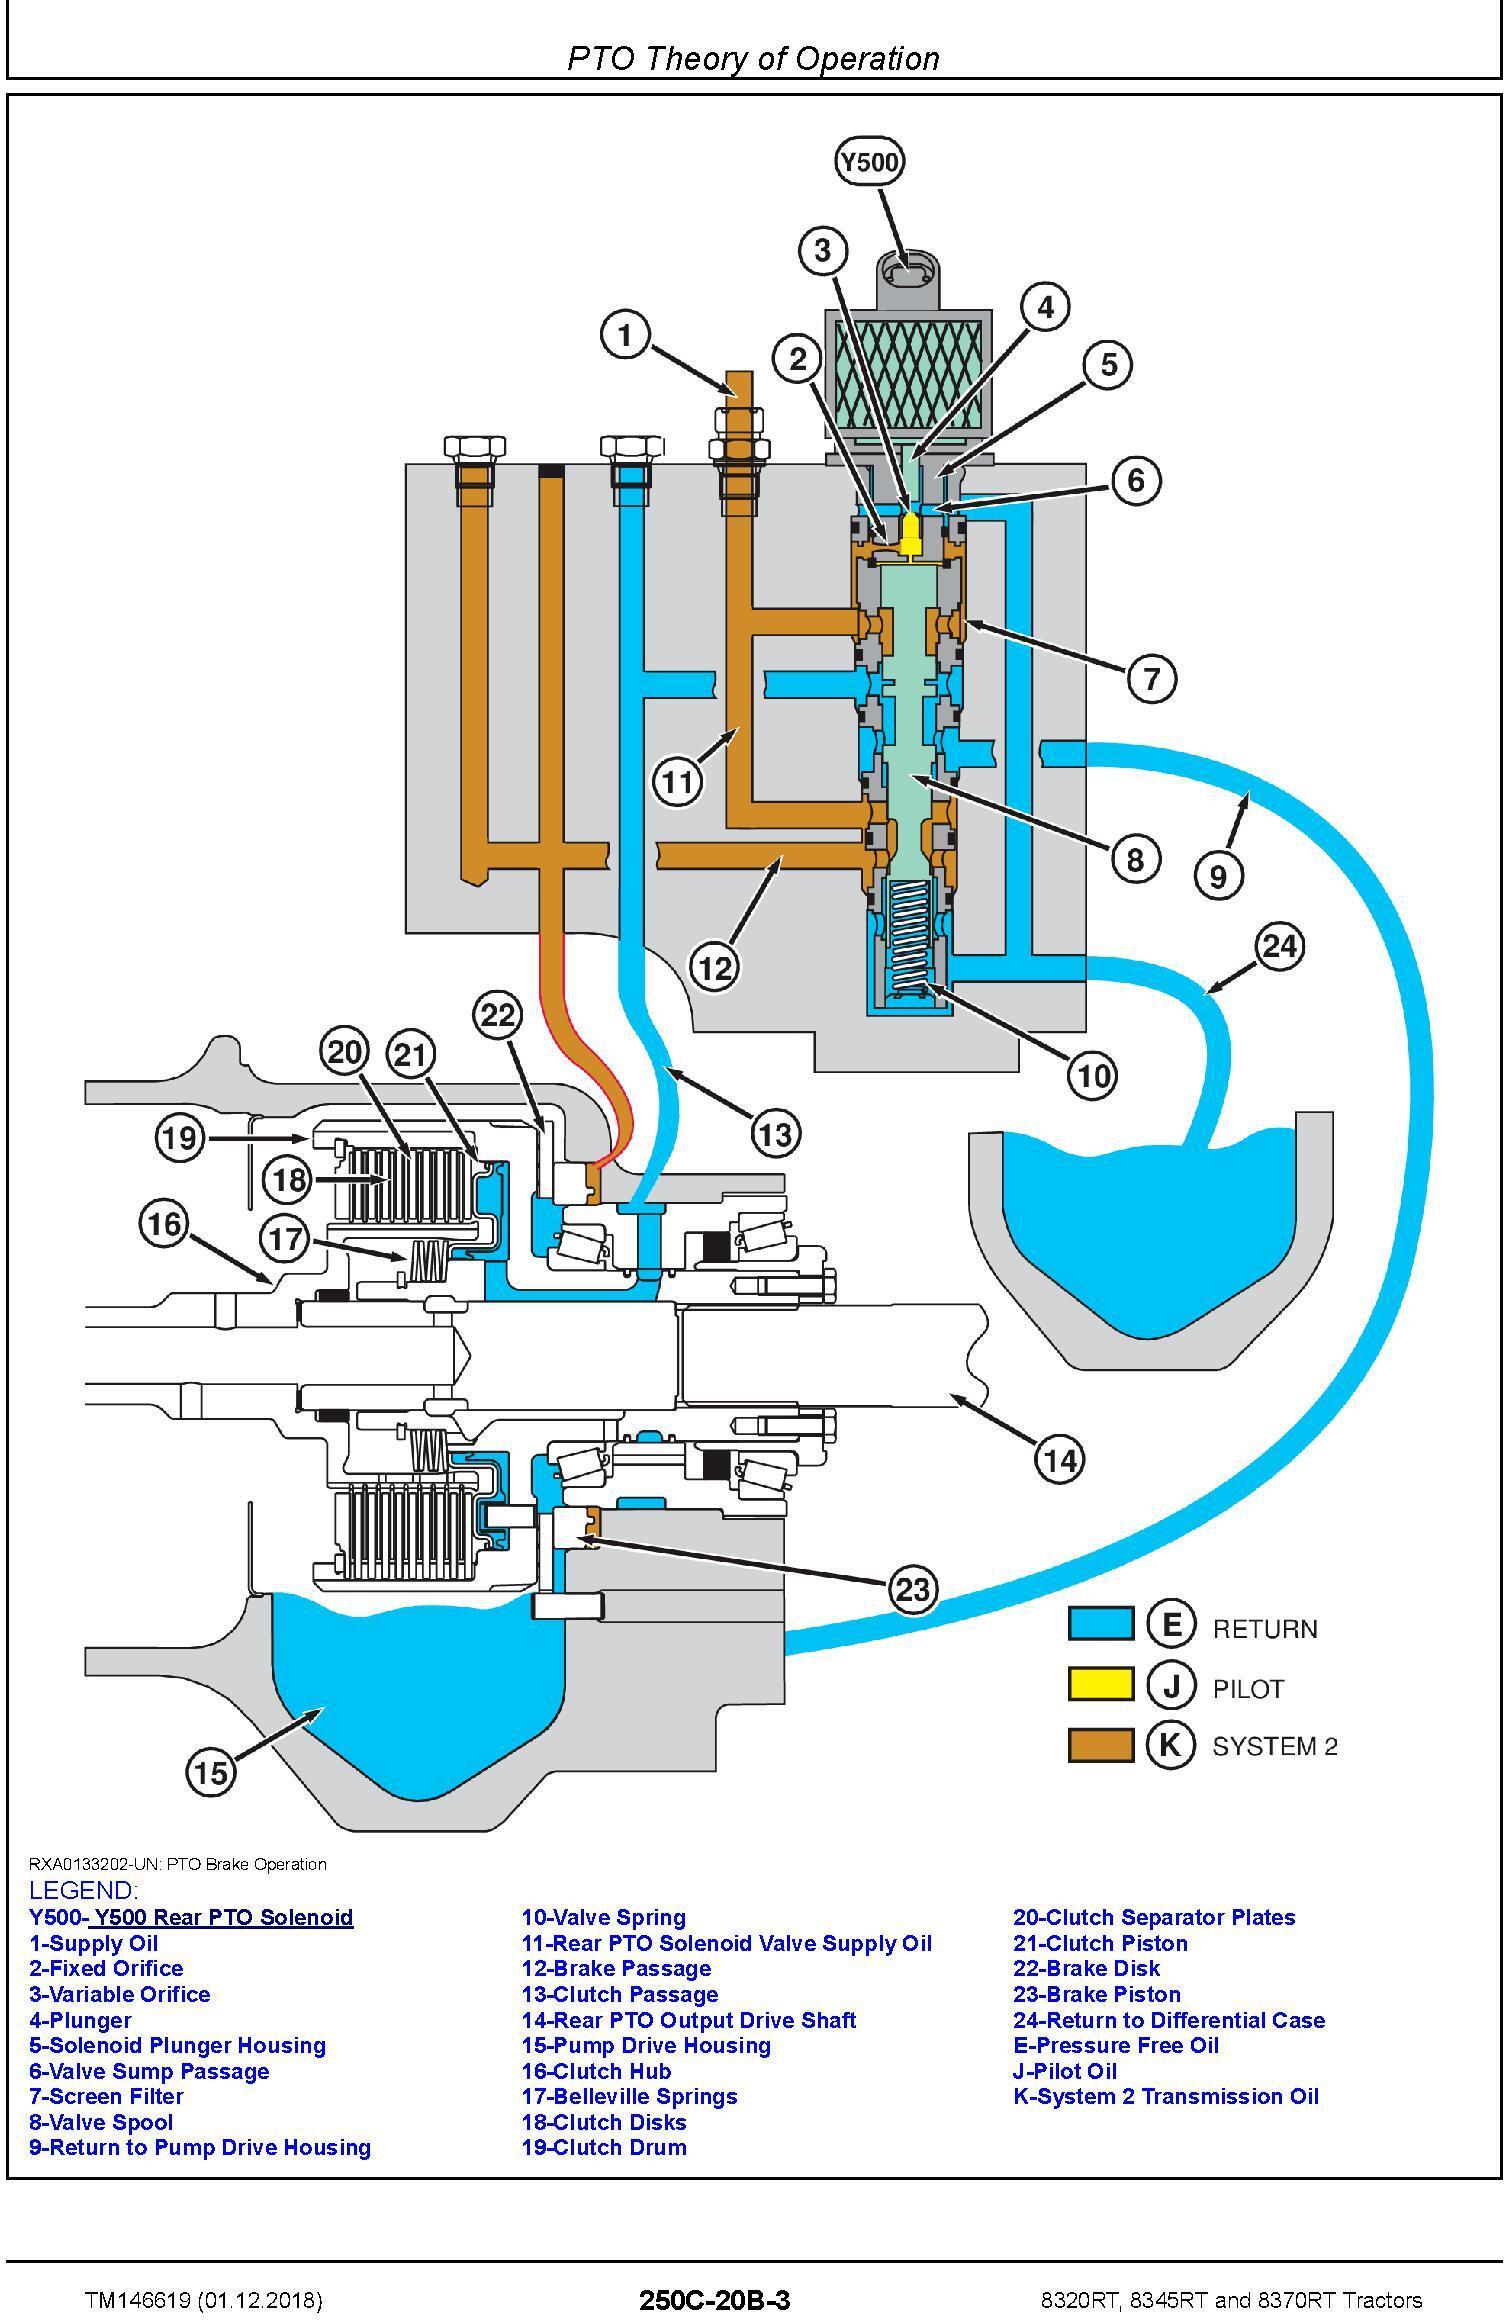 John Deere 8320RT, 8345RT, 8370RT Tractors (SN.917000-920000) Diagnostic Technical Manual (TM146619) - 2